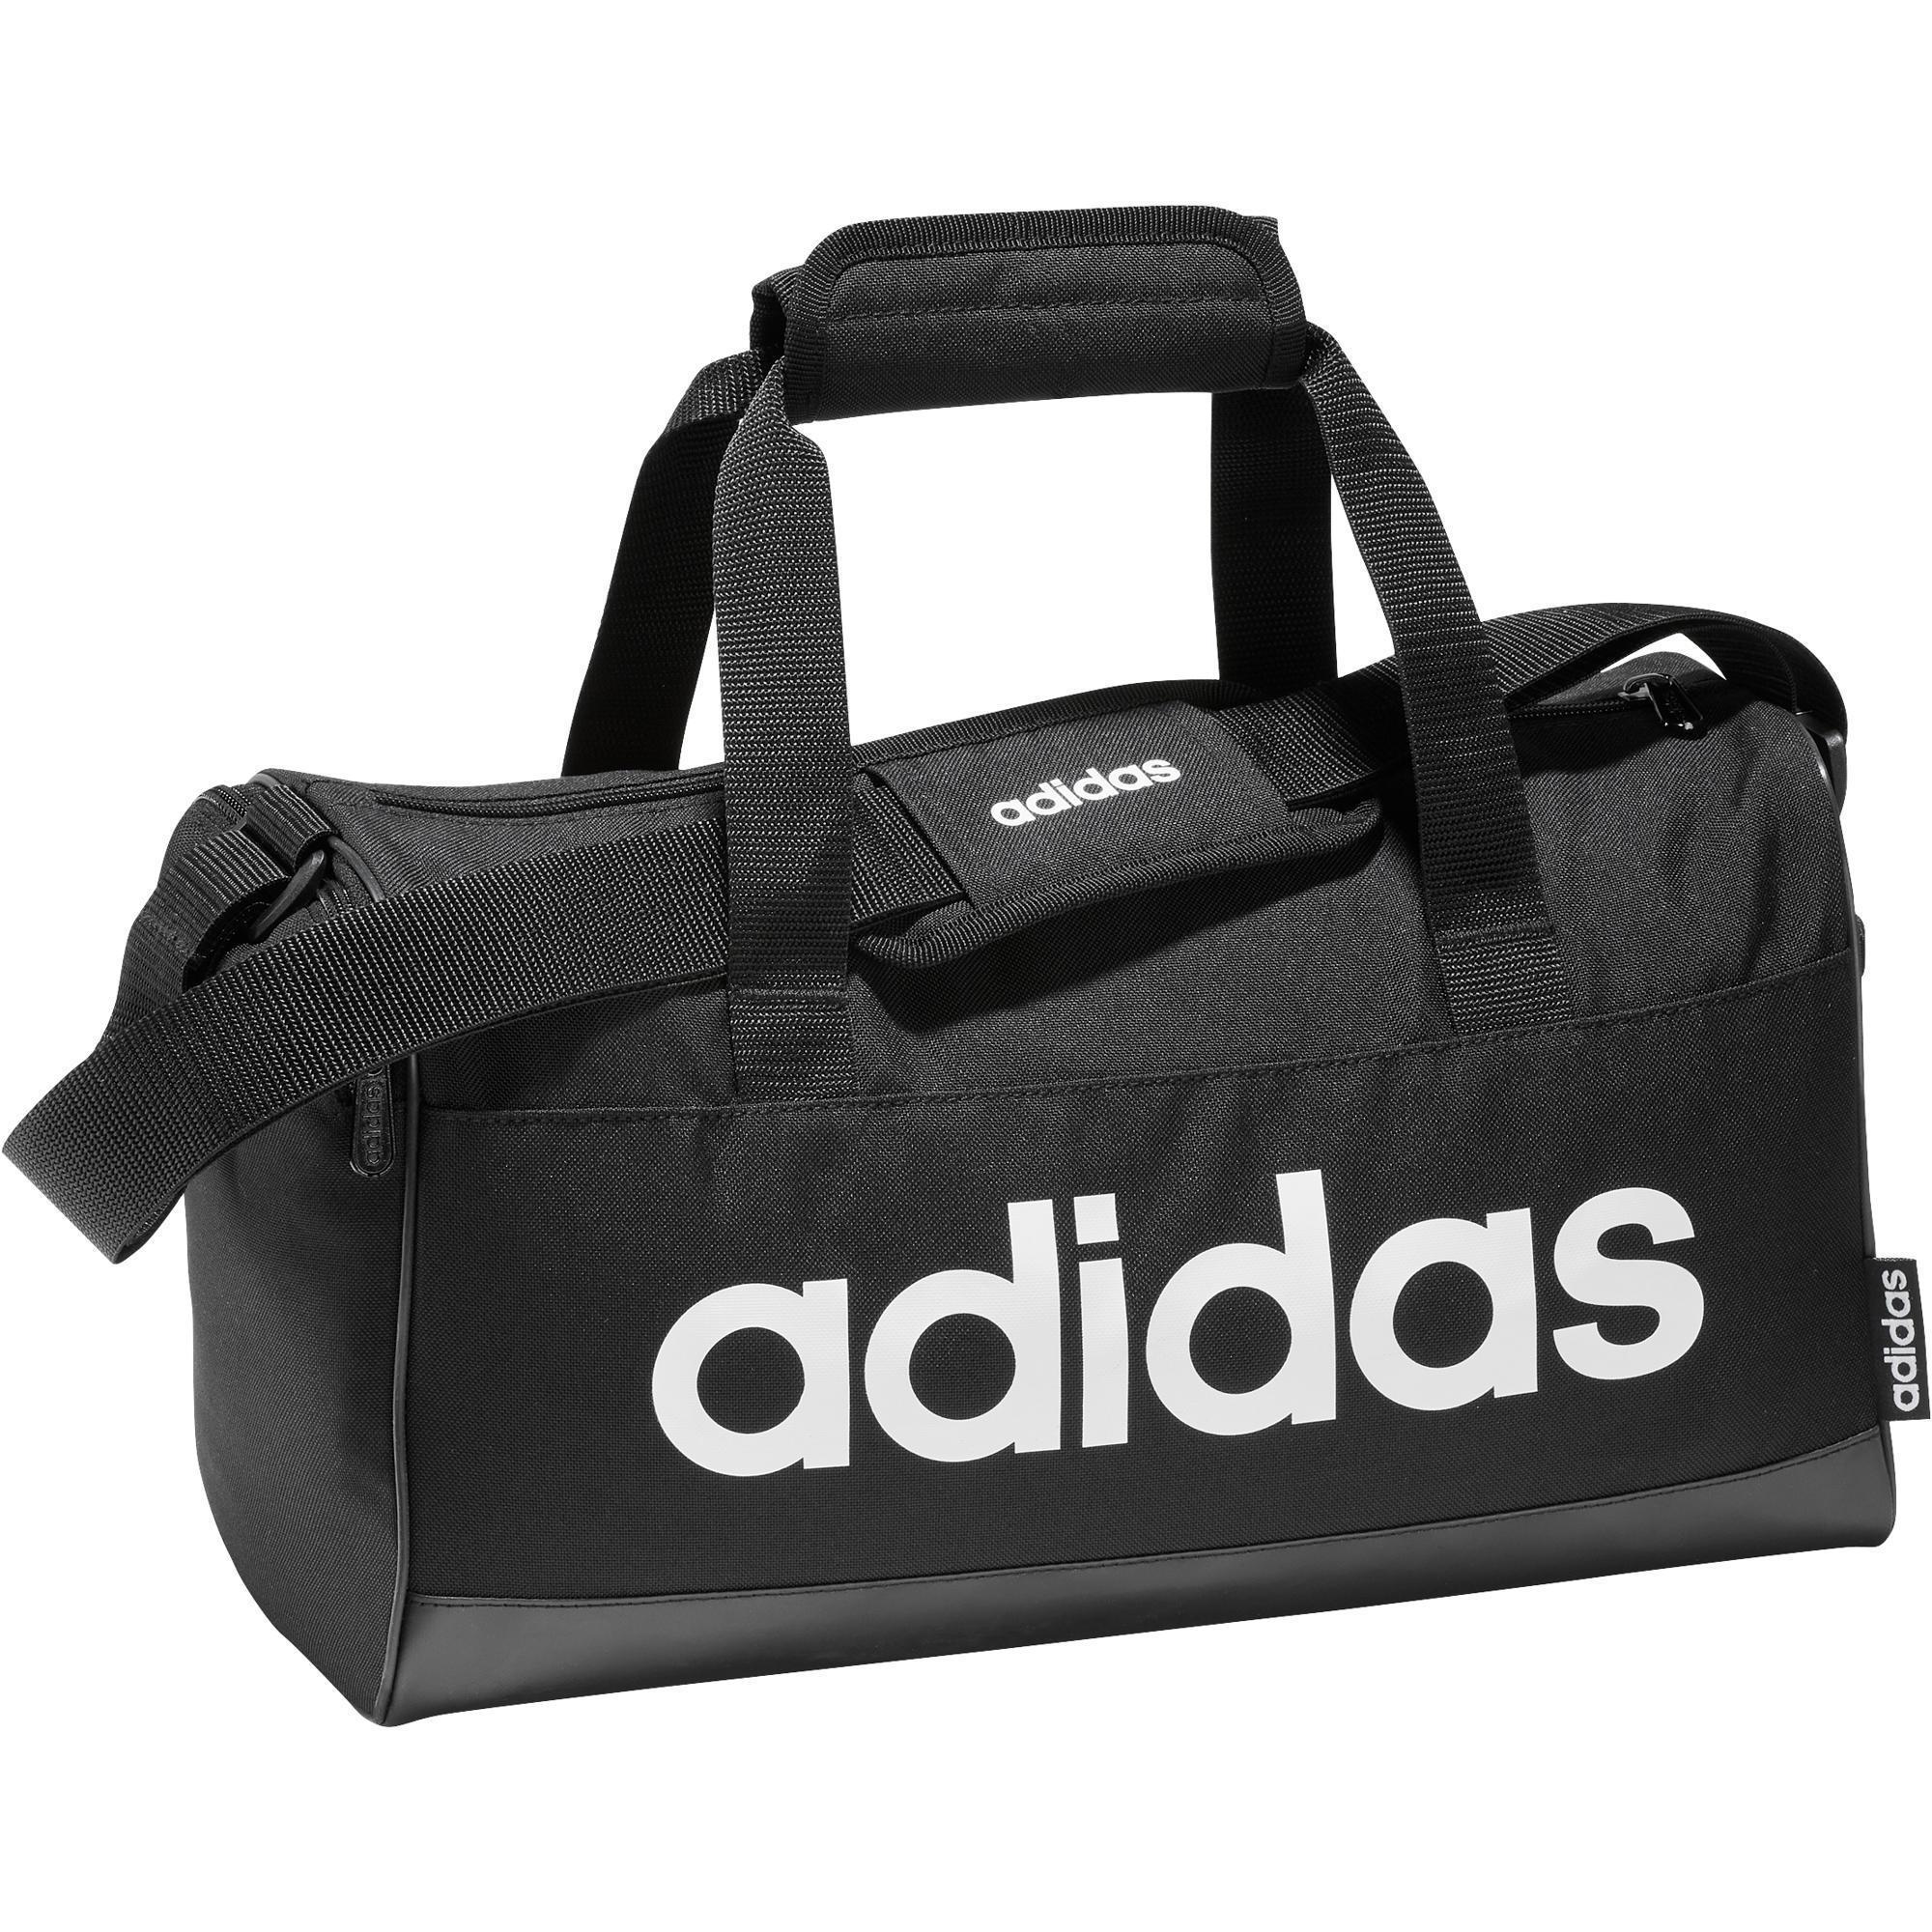 Sac de sport adidas XS - 15 L, noir